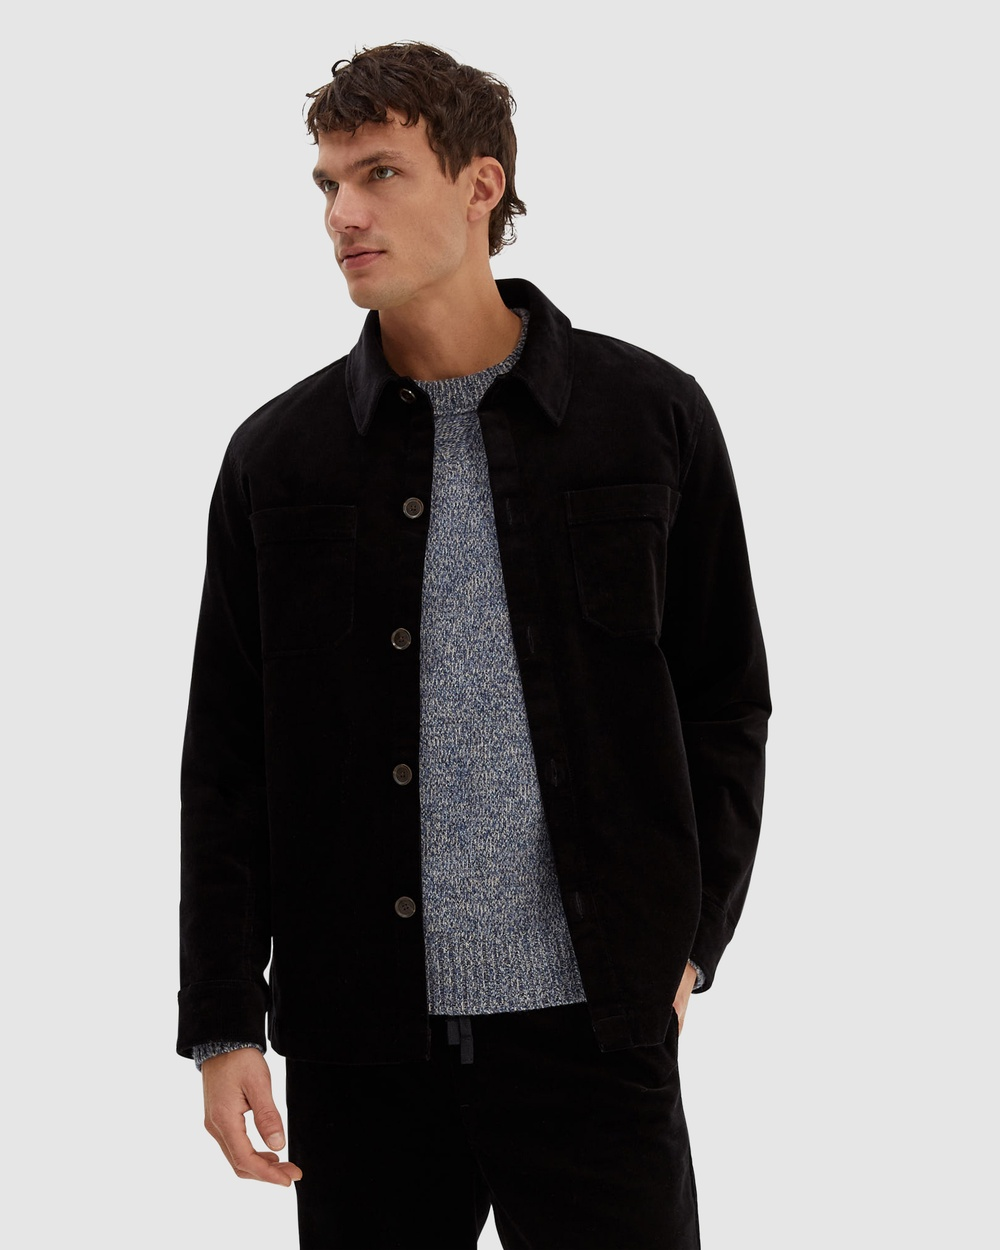 SABA SB Clive Cord Shacket Coats & Jackets Black